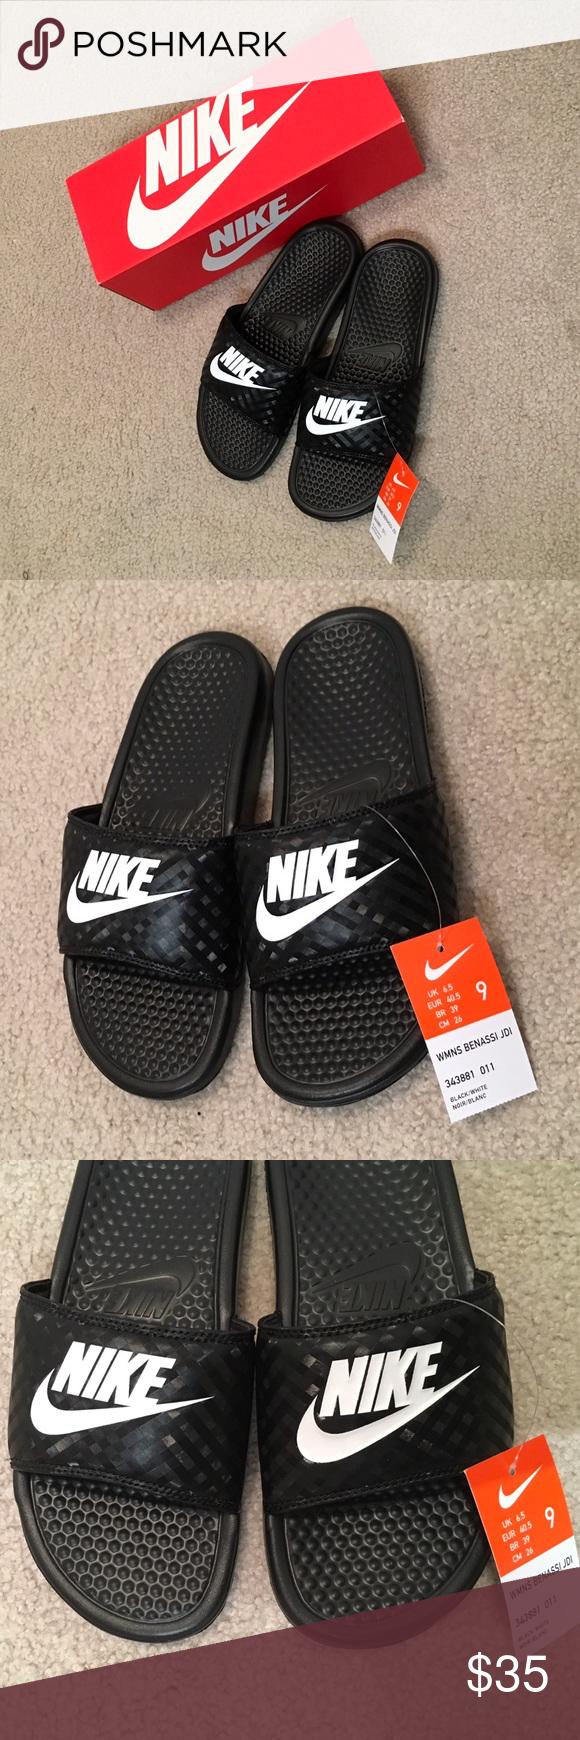 *NEW* Women's NIKE Benassi Slides - Size 9 Brand new, never worn Nike